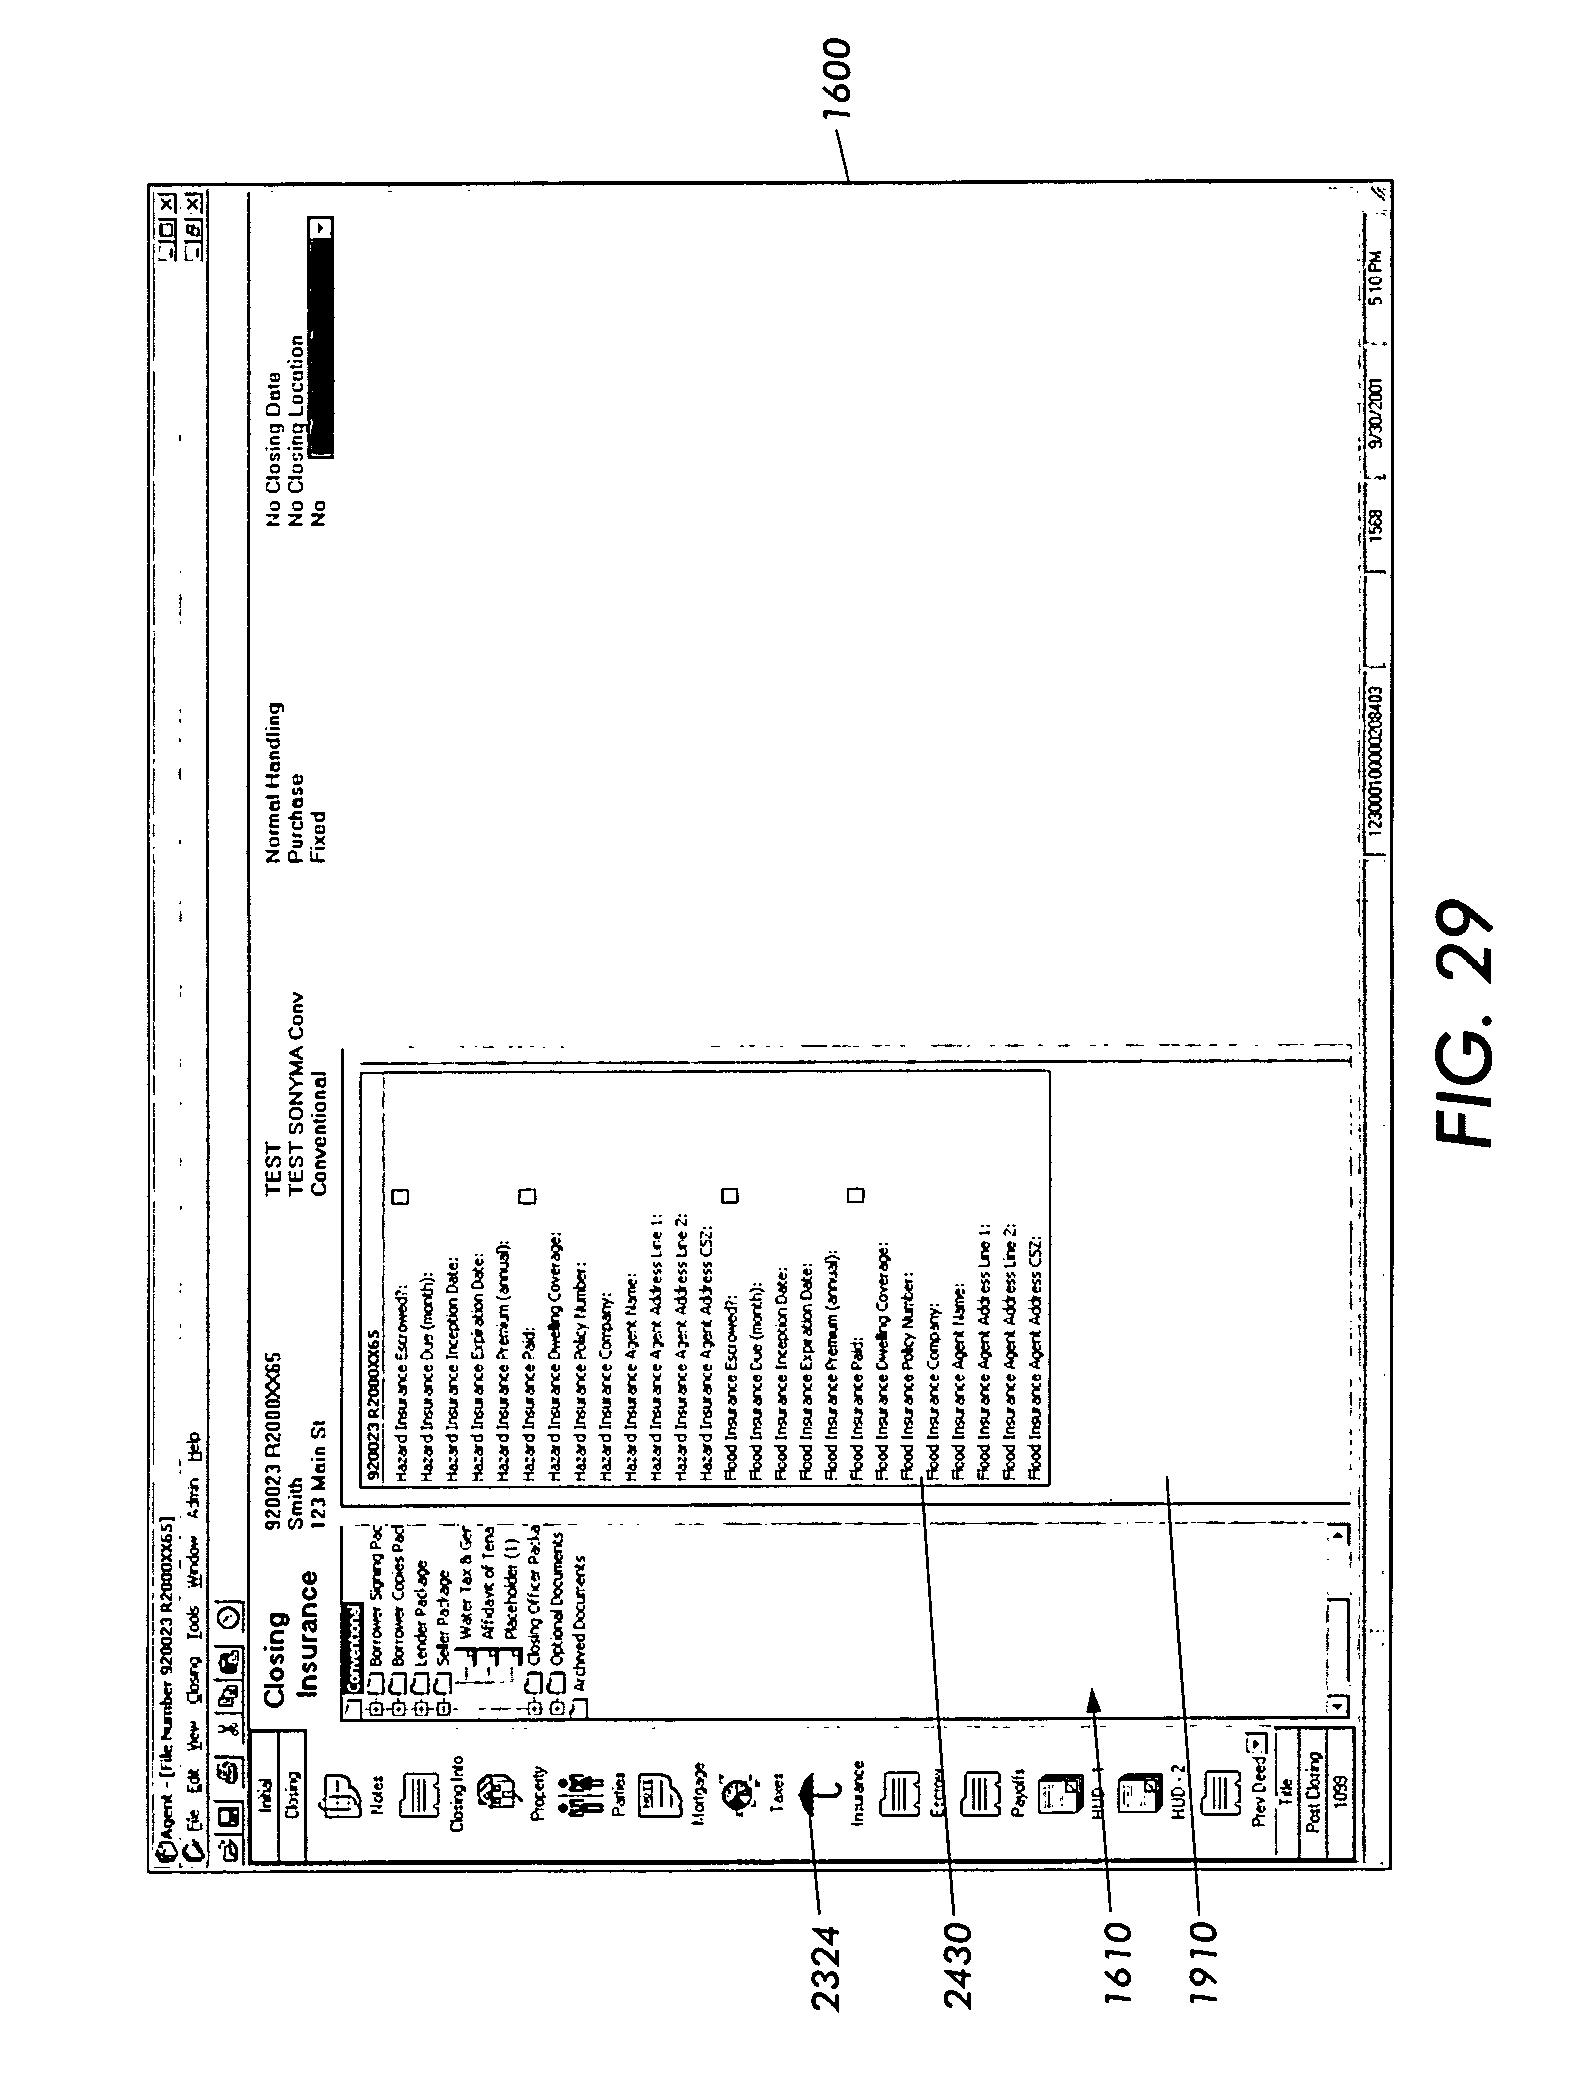 Patent US 7,707,153 B1